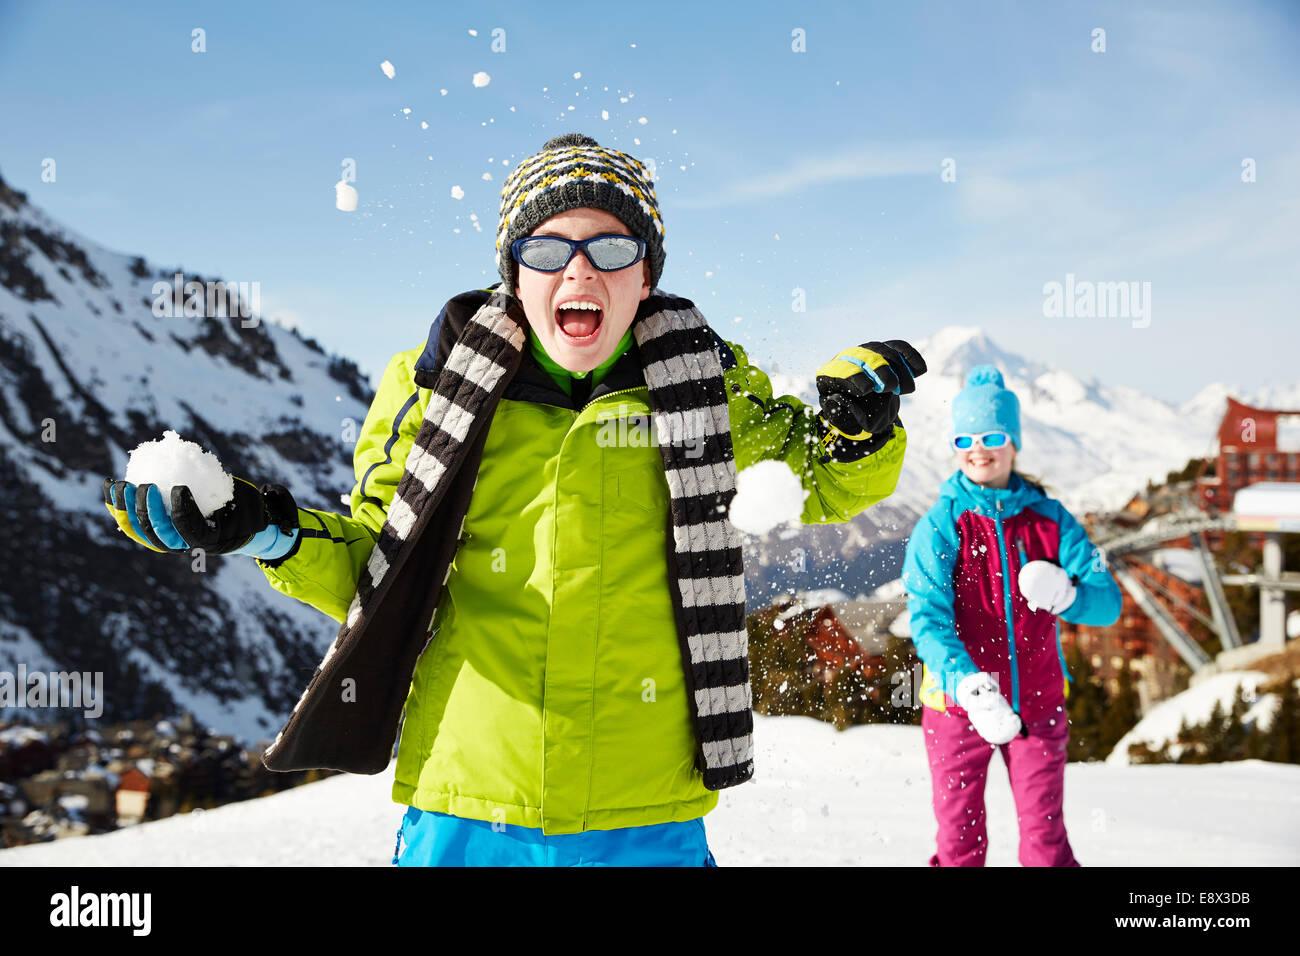 Frères et sœurs having snowball fight Photo Stock